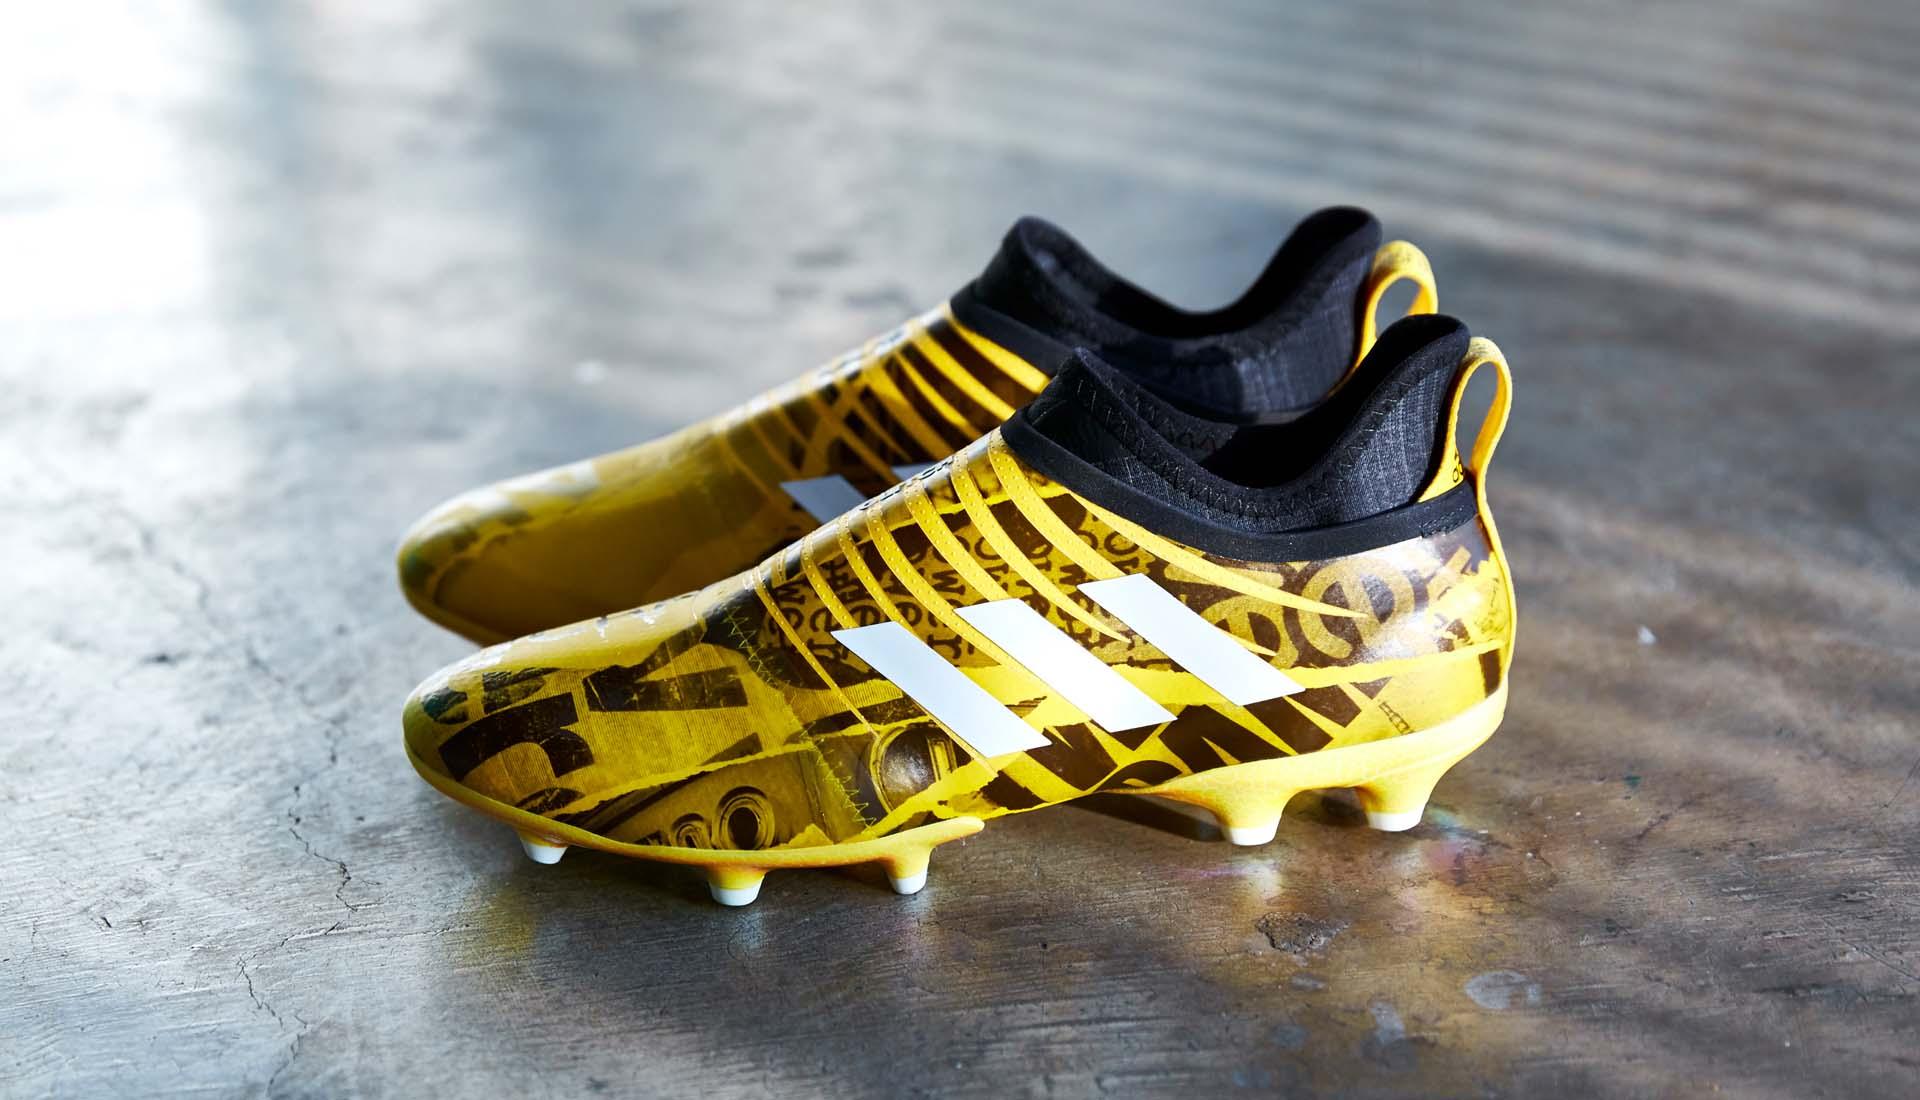 adidas glitch in italia